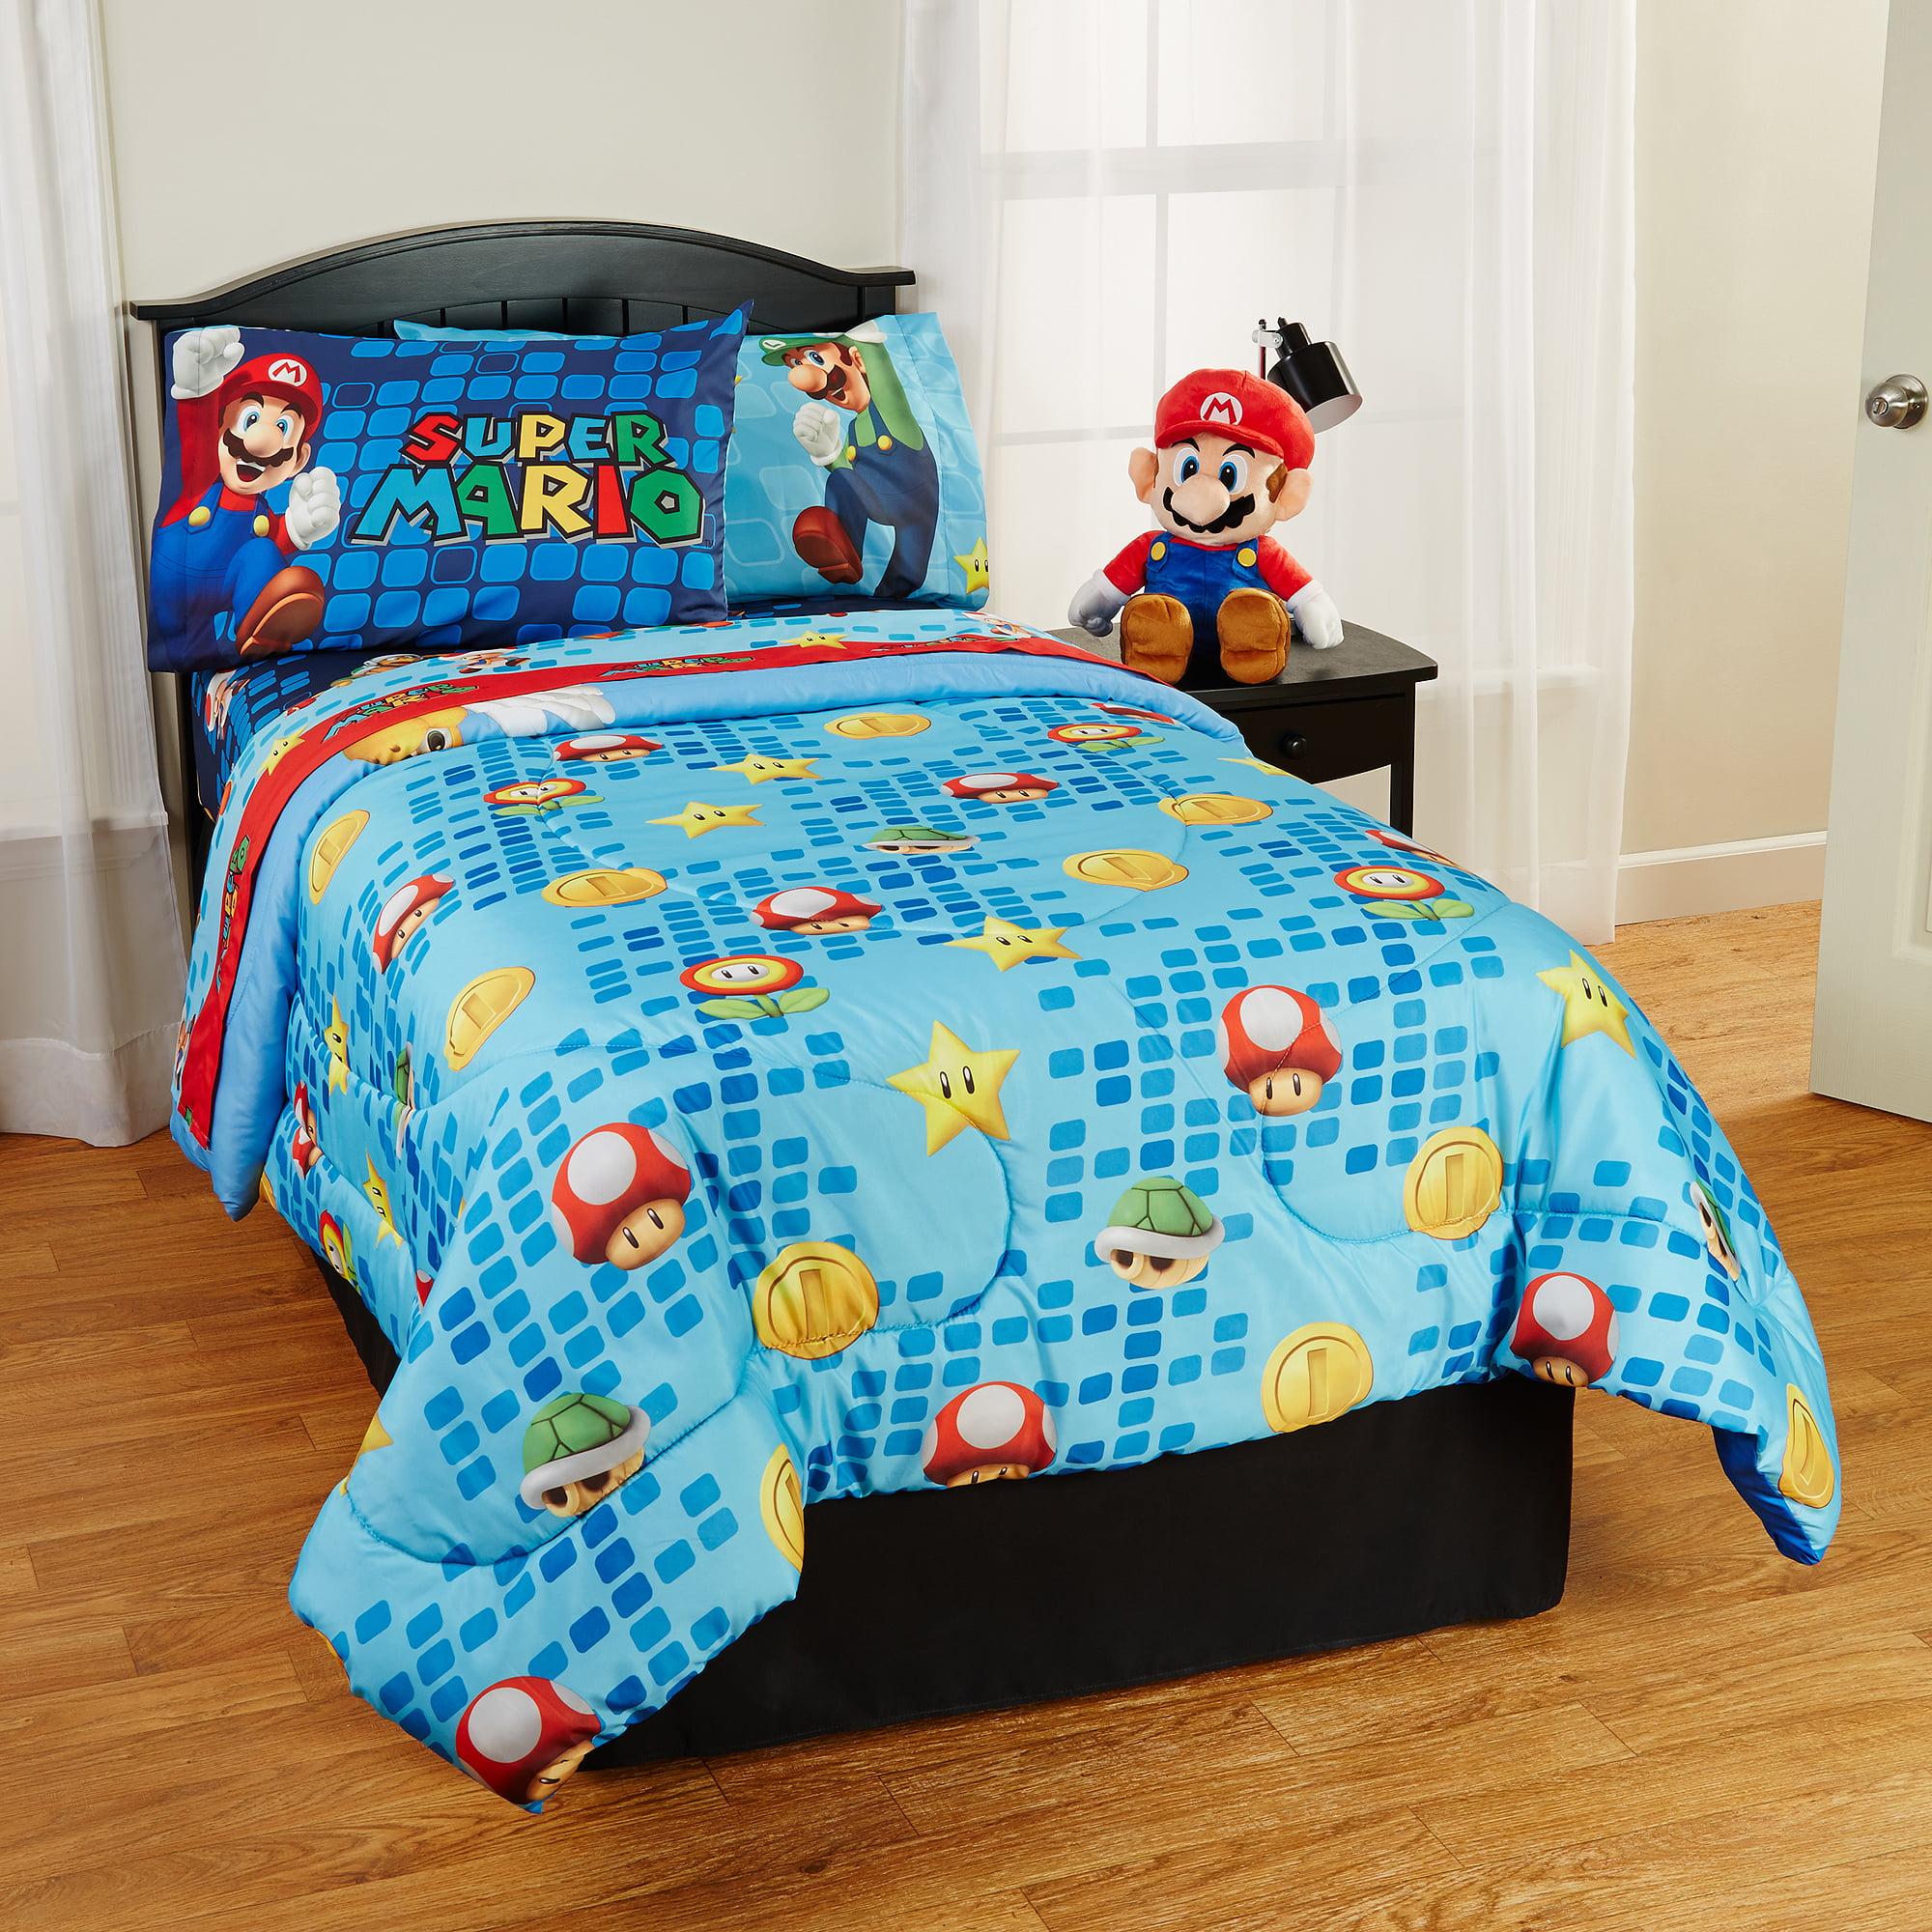 Super Mario Comforter Com ...